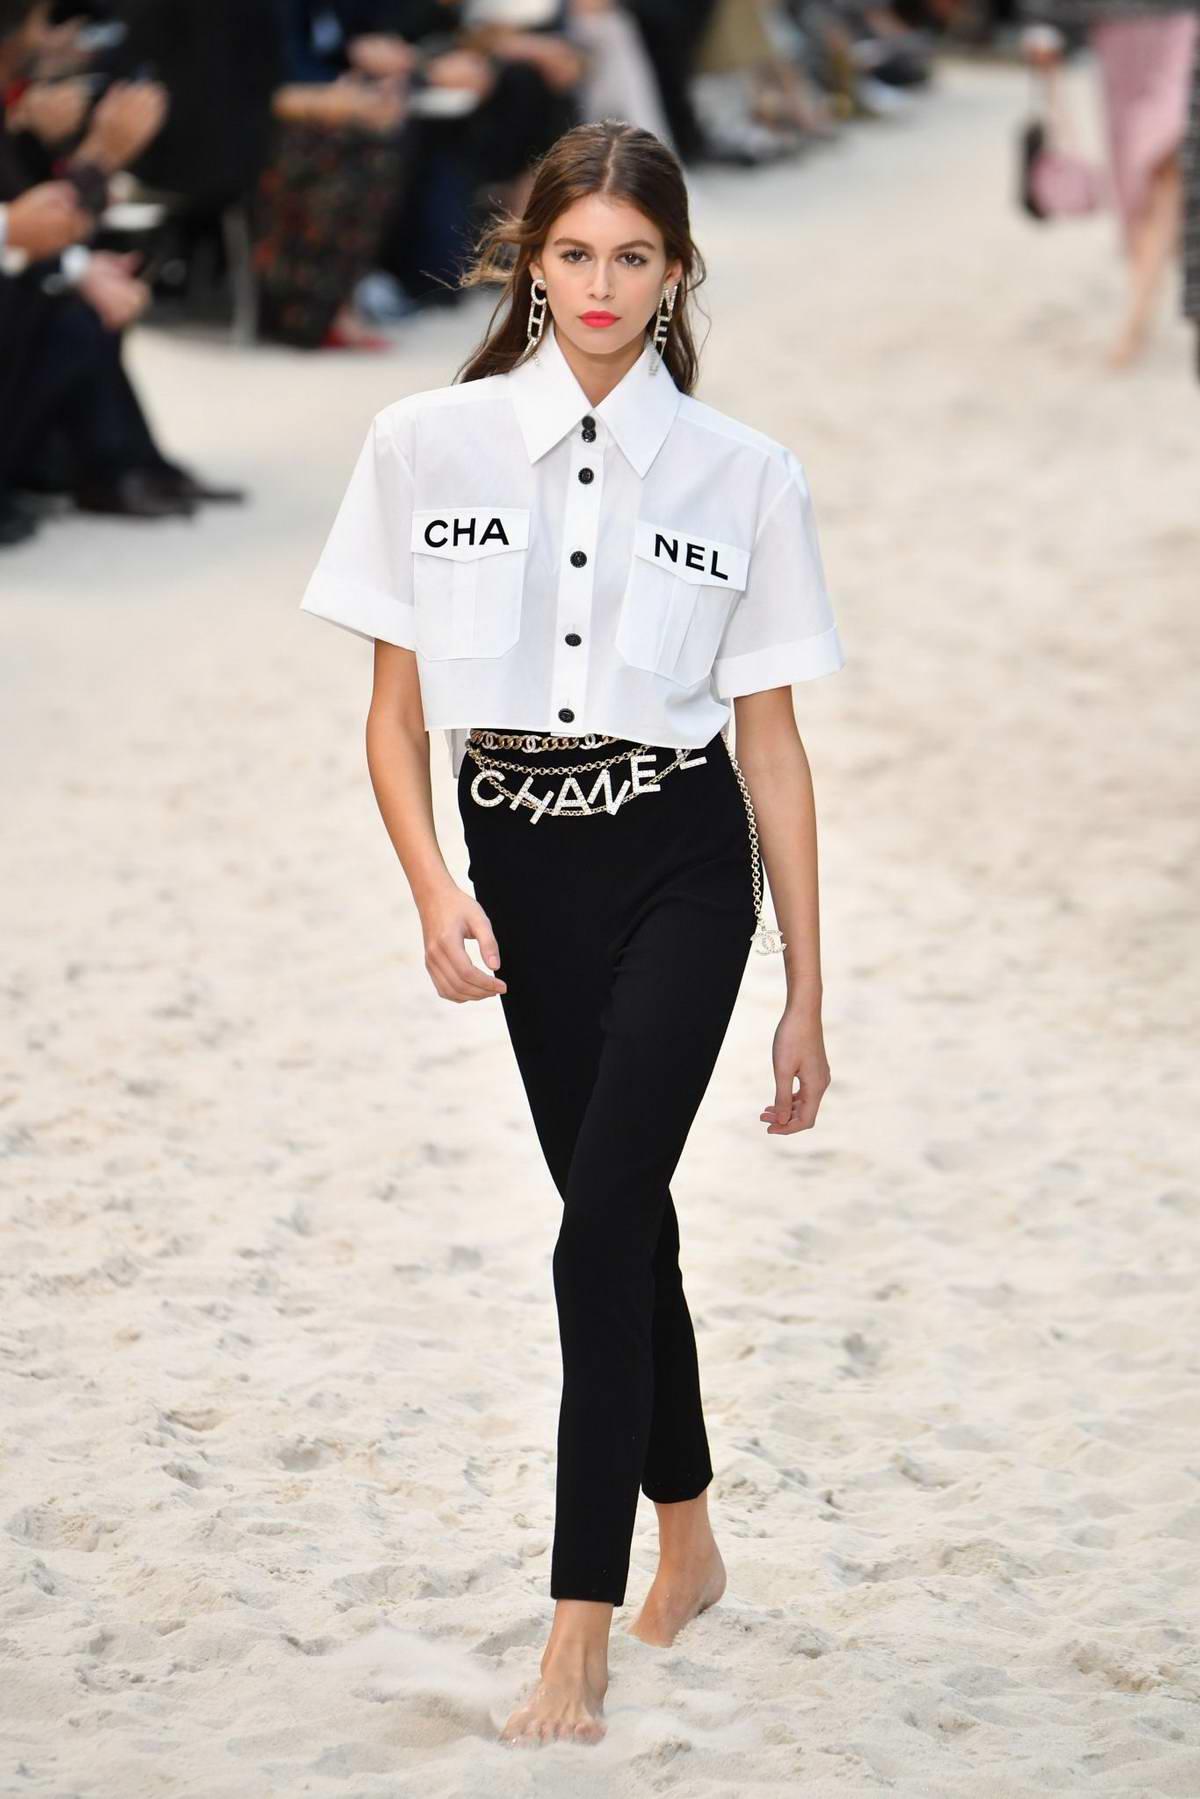 Kaia Gerber, Grace Elizabeth and Hannah Ferguson Walks the runway for the Chanel show during Paris Fashion Week in Paris, France